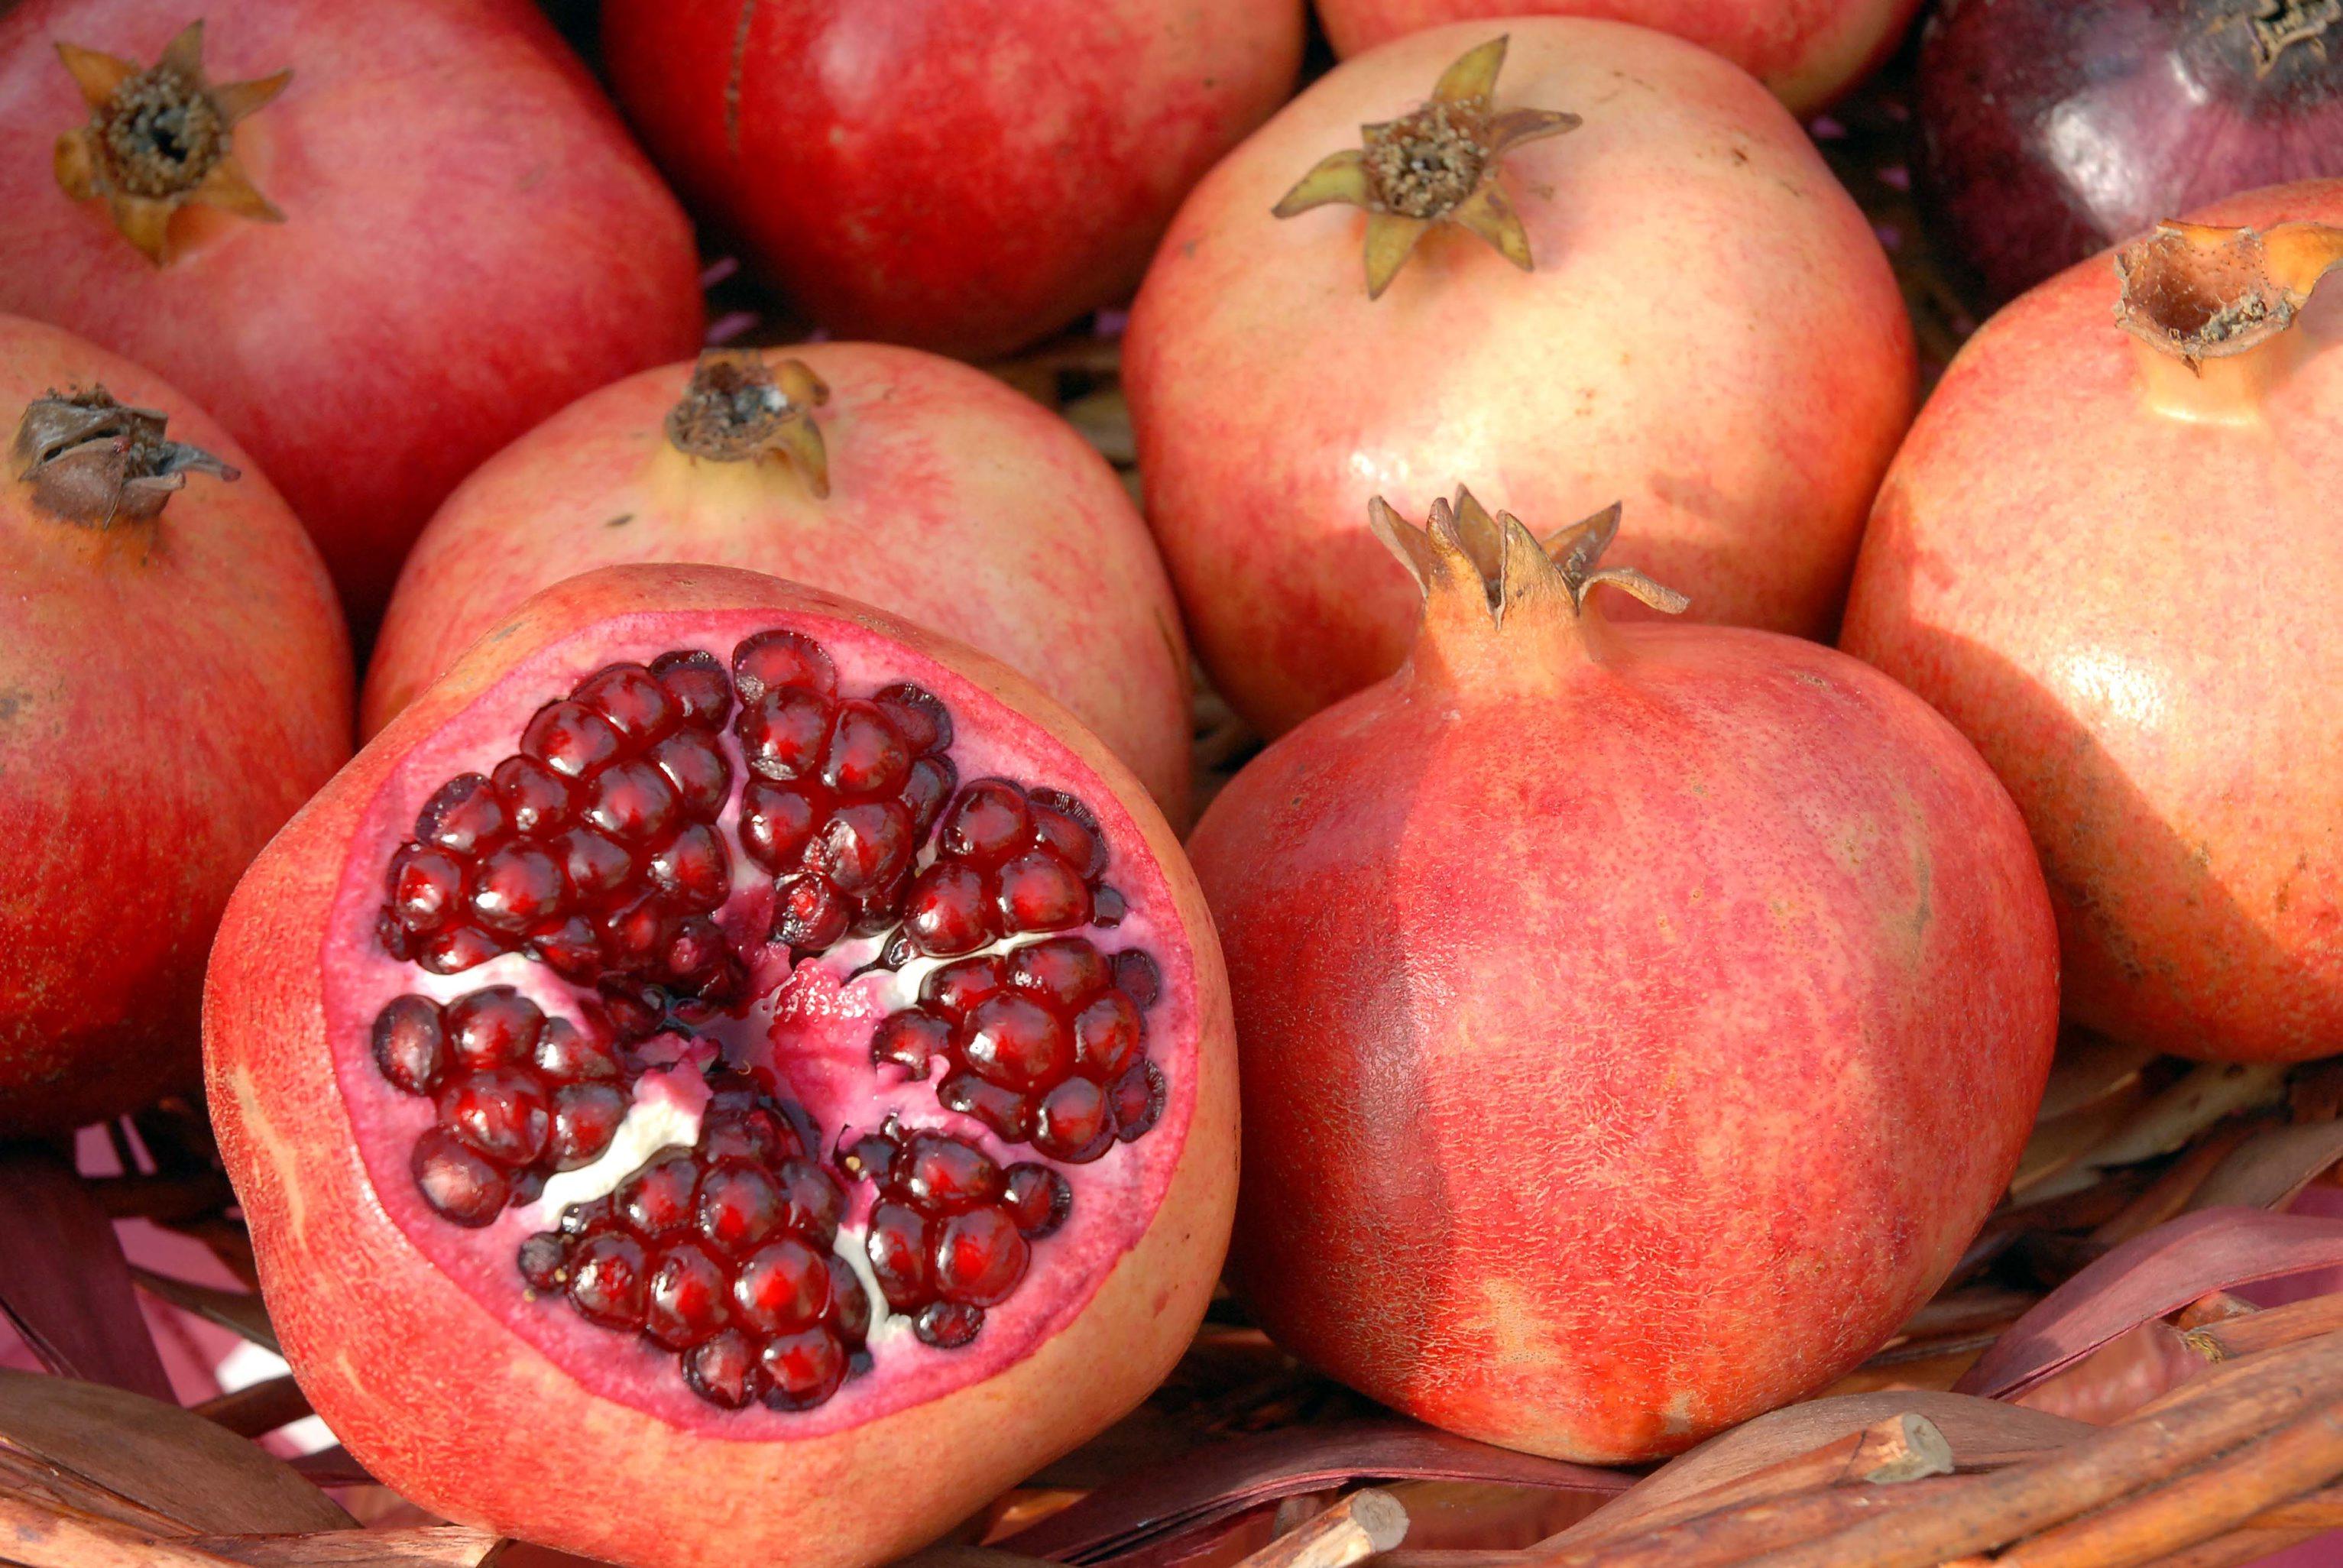 File:Flickr - Government Press Office (GPO) - Pomegranate ...